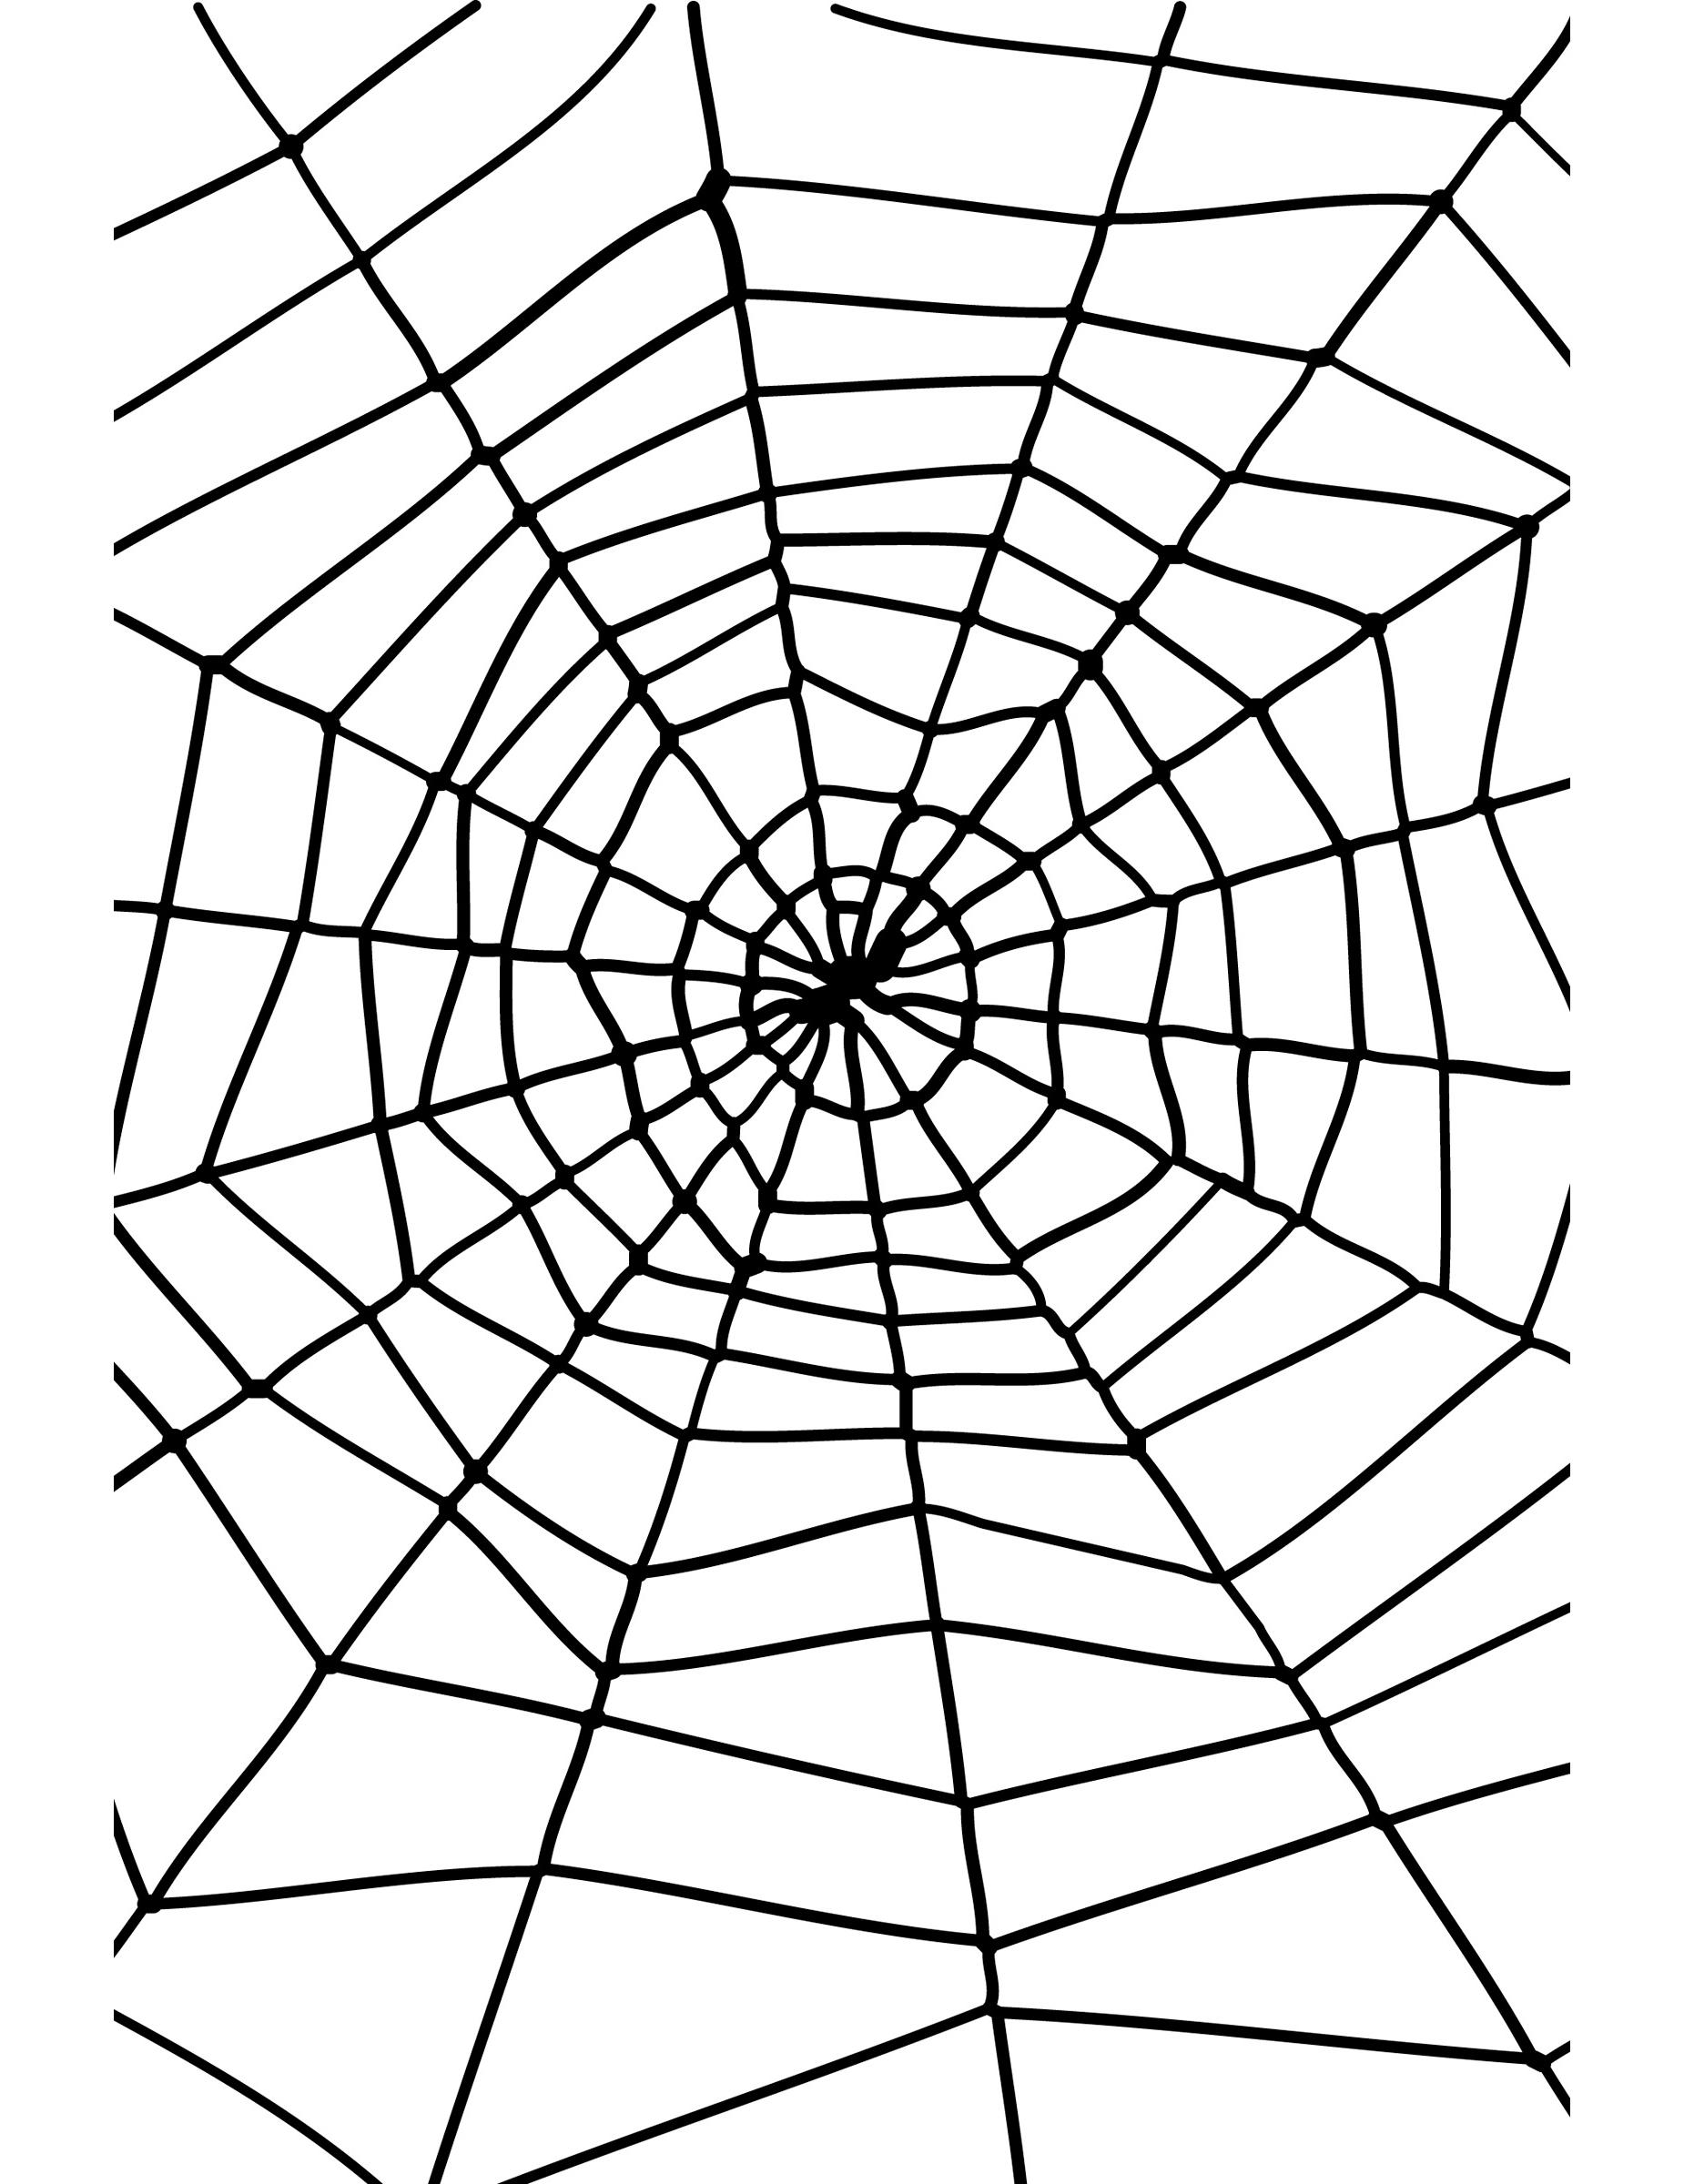 Toile d 39 araign e halloween deguise toi achat de decoration animation - Maquillage toile d araignee ...